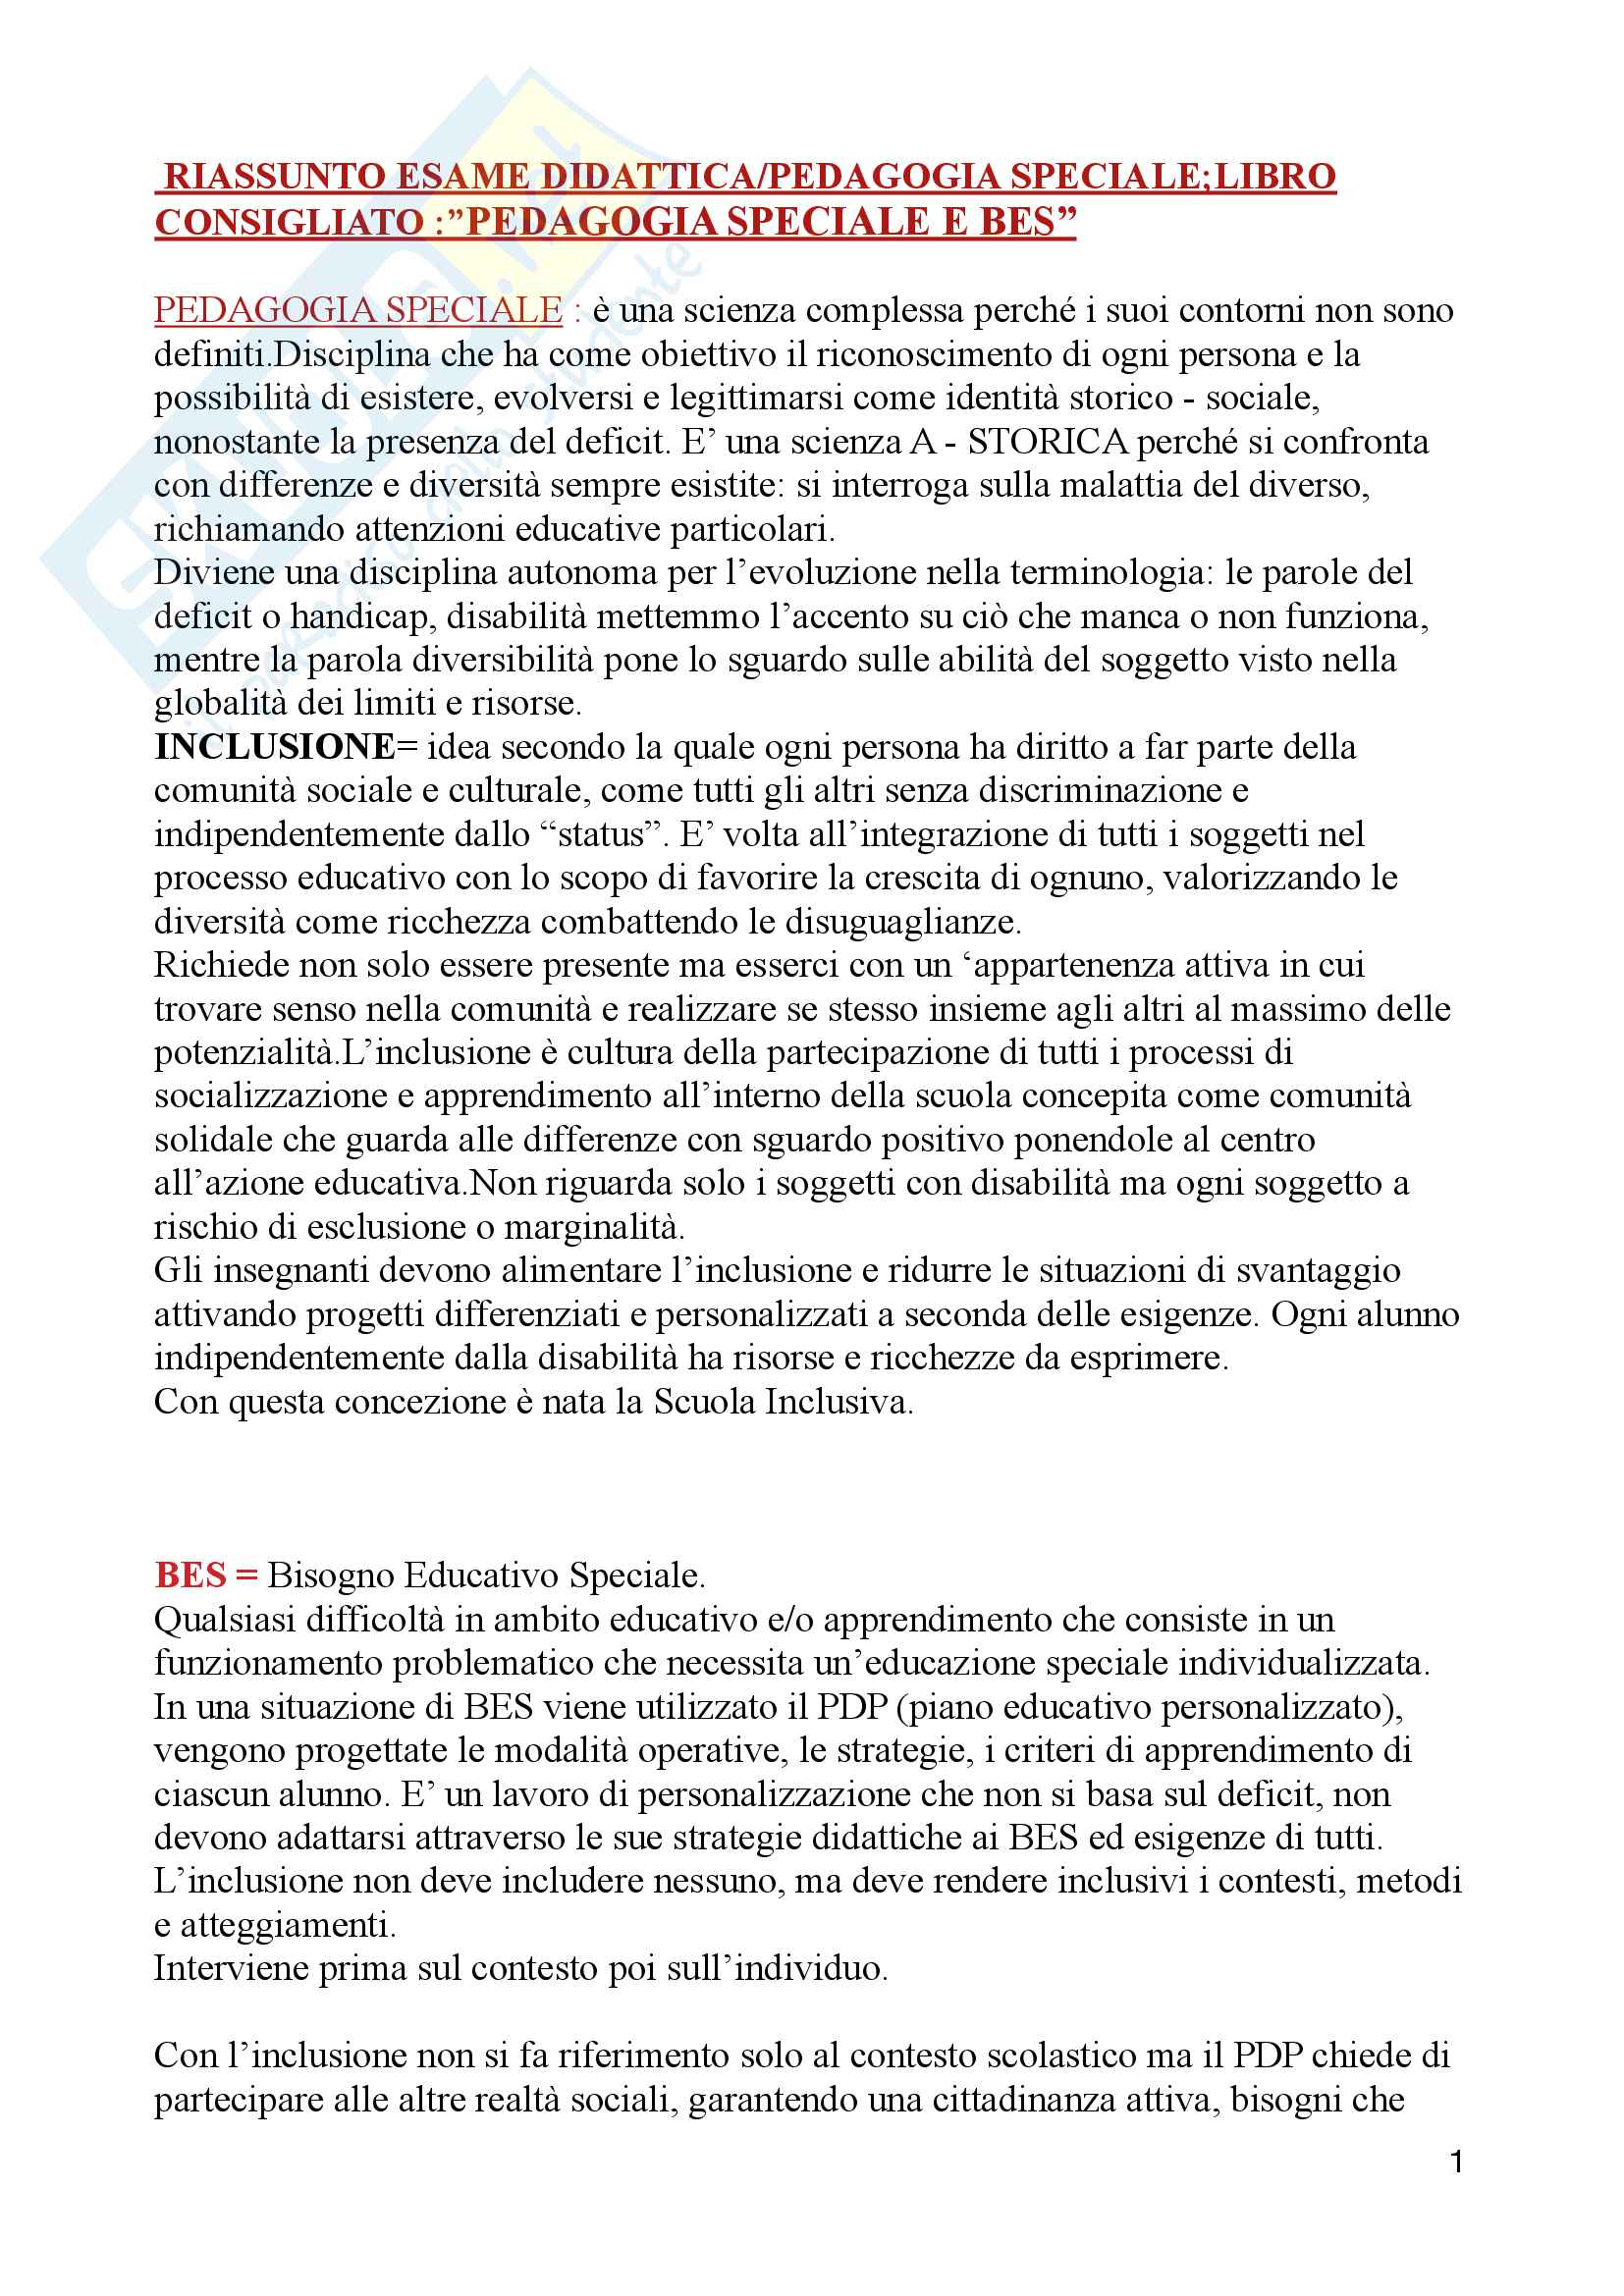 "Riassunto esame pedagogia/didattica speciale, prof. Patrizia Gaspari, libro consigliato ""Pedagogia speciale e bes"", Patrizia Gaspari"